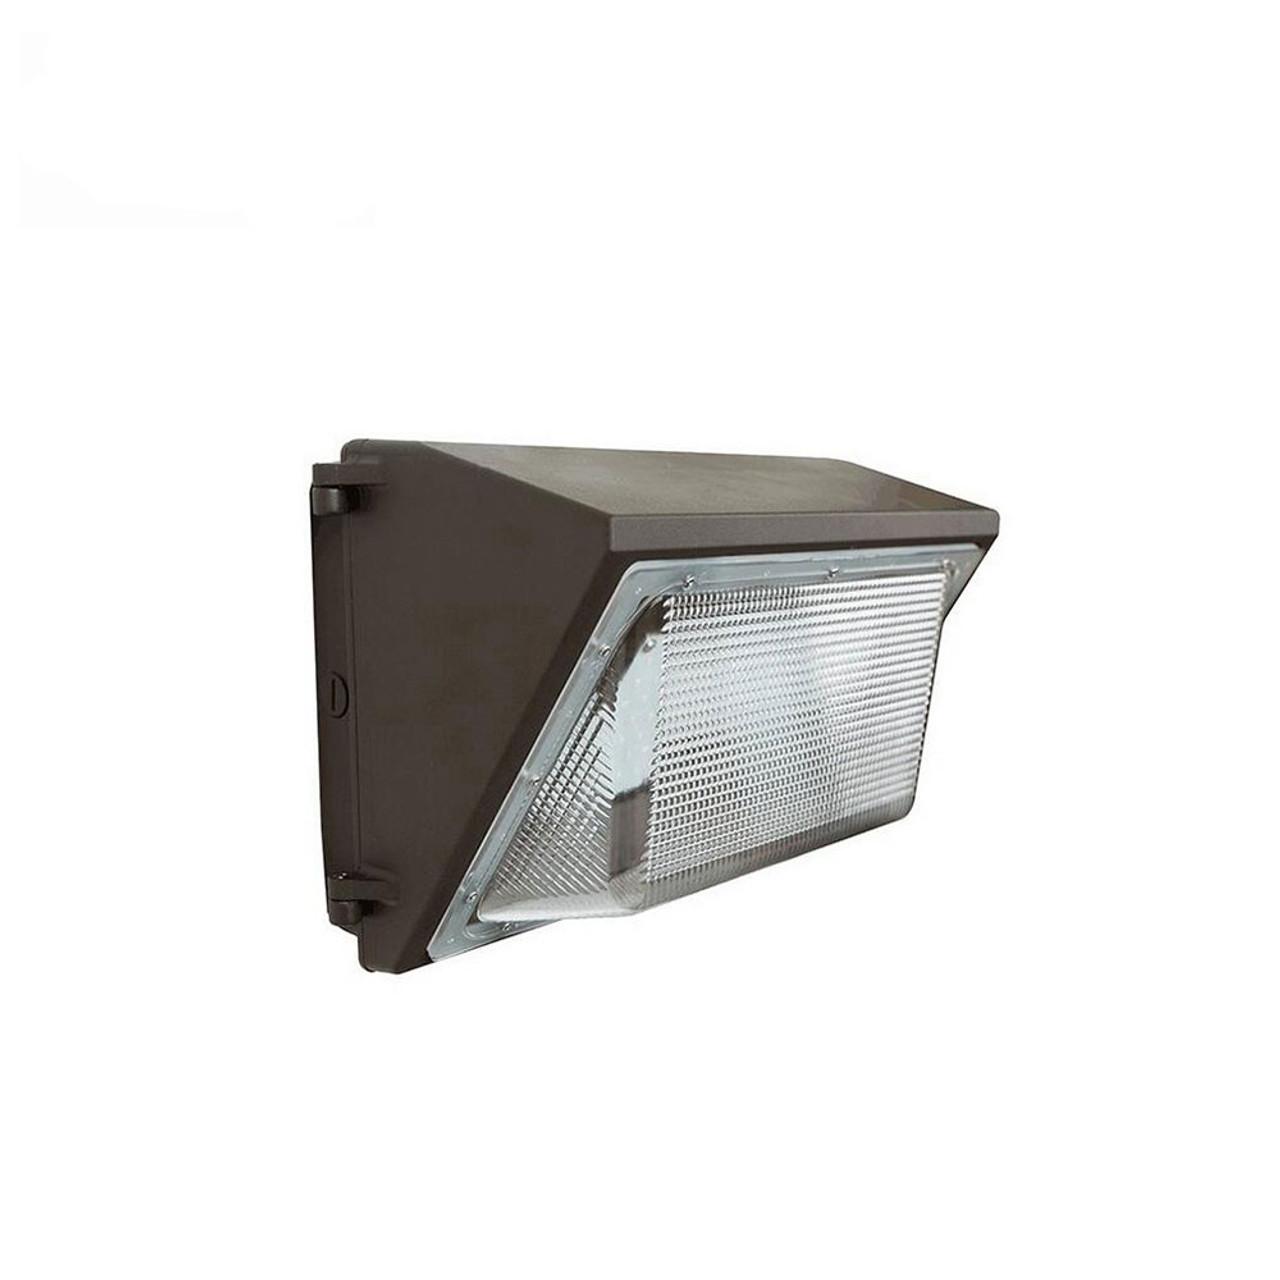 LED Wall Pack, 150 Watt, 18000 lumen, 5000 Kelvin, 100-277 volt, UL and DLC Listed